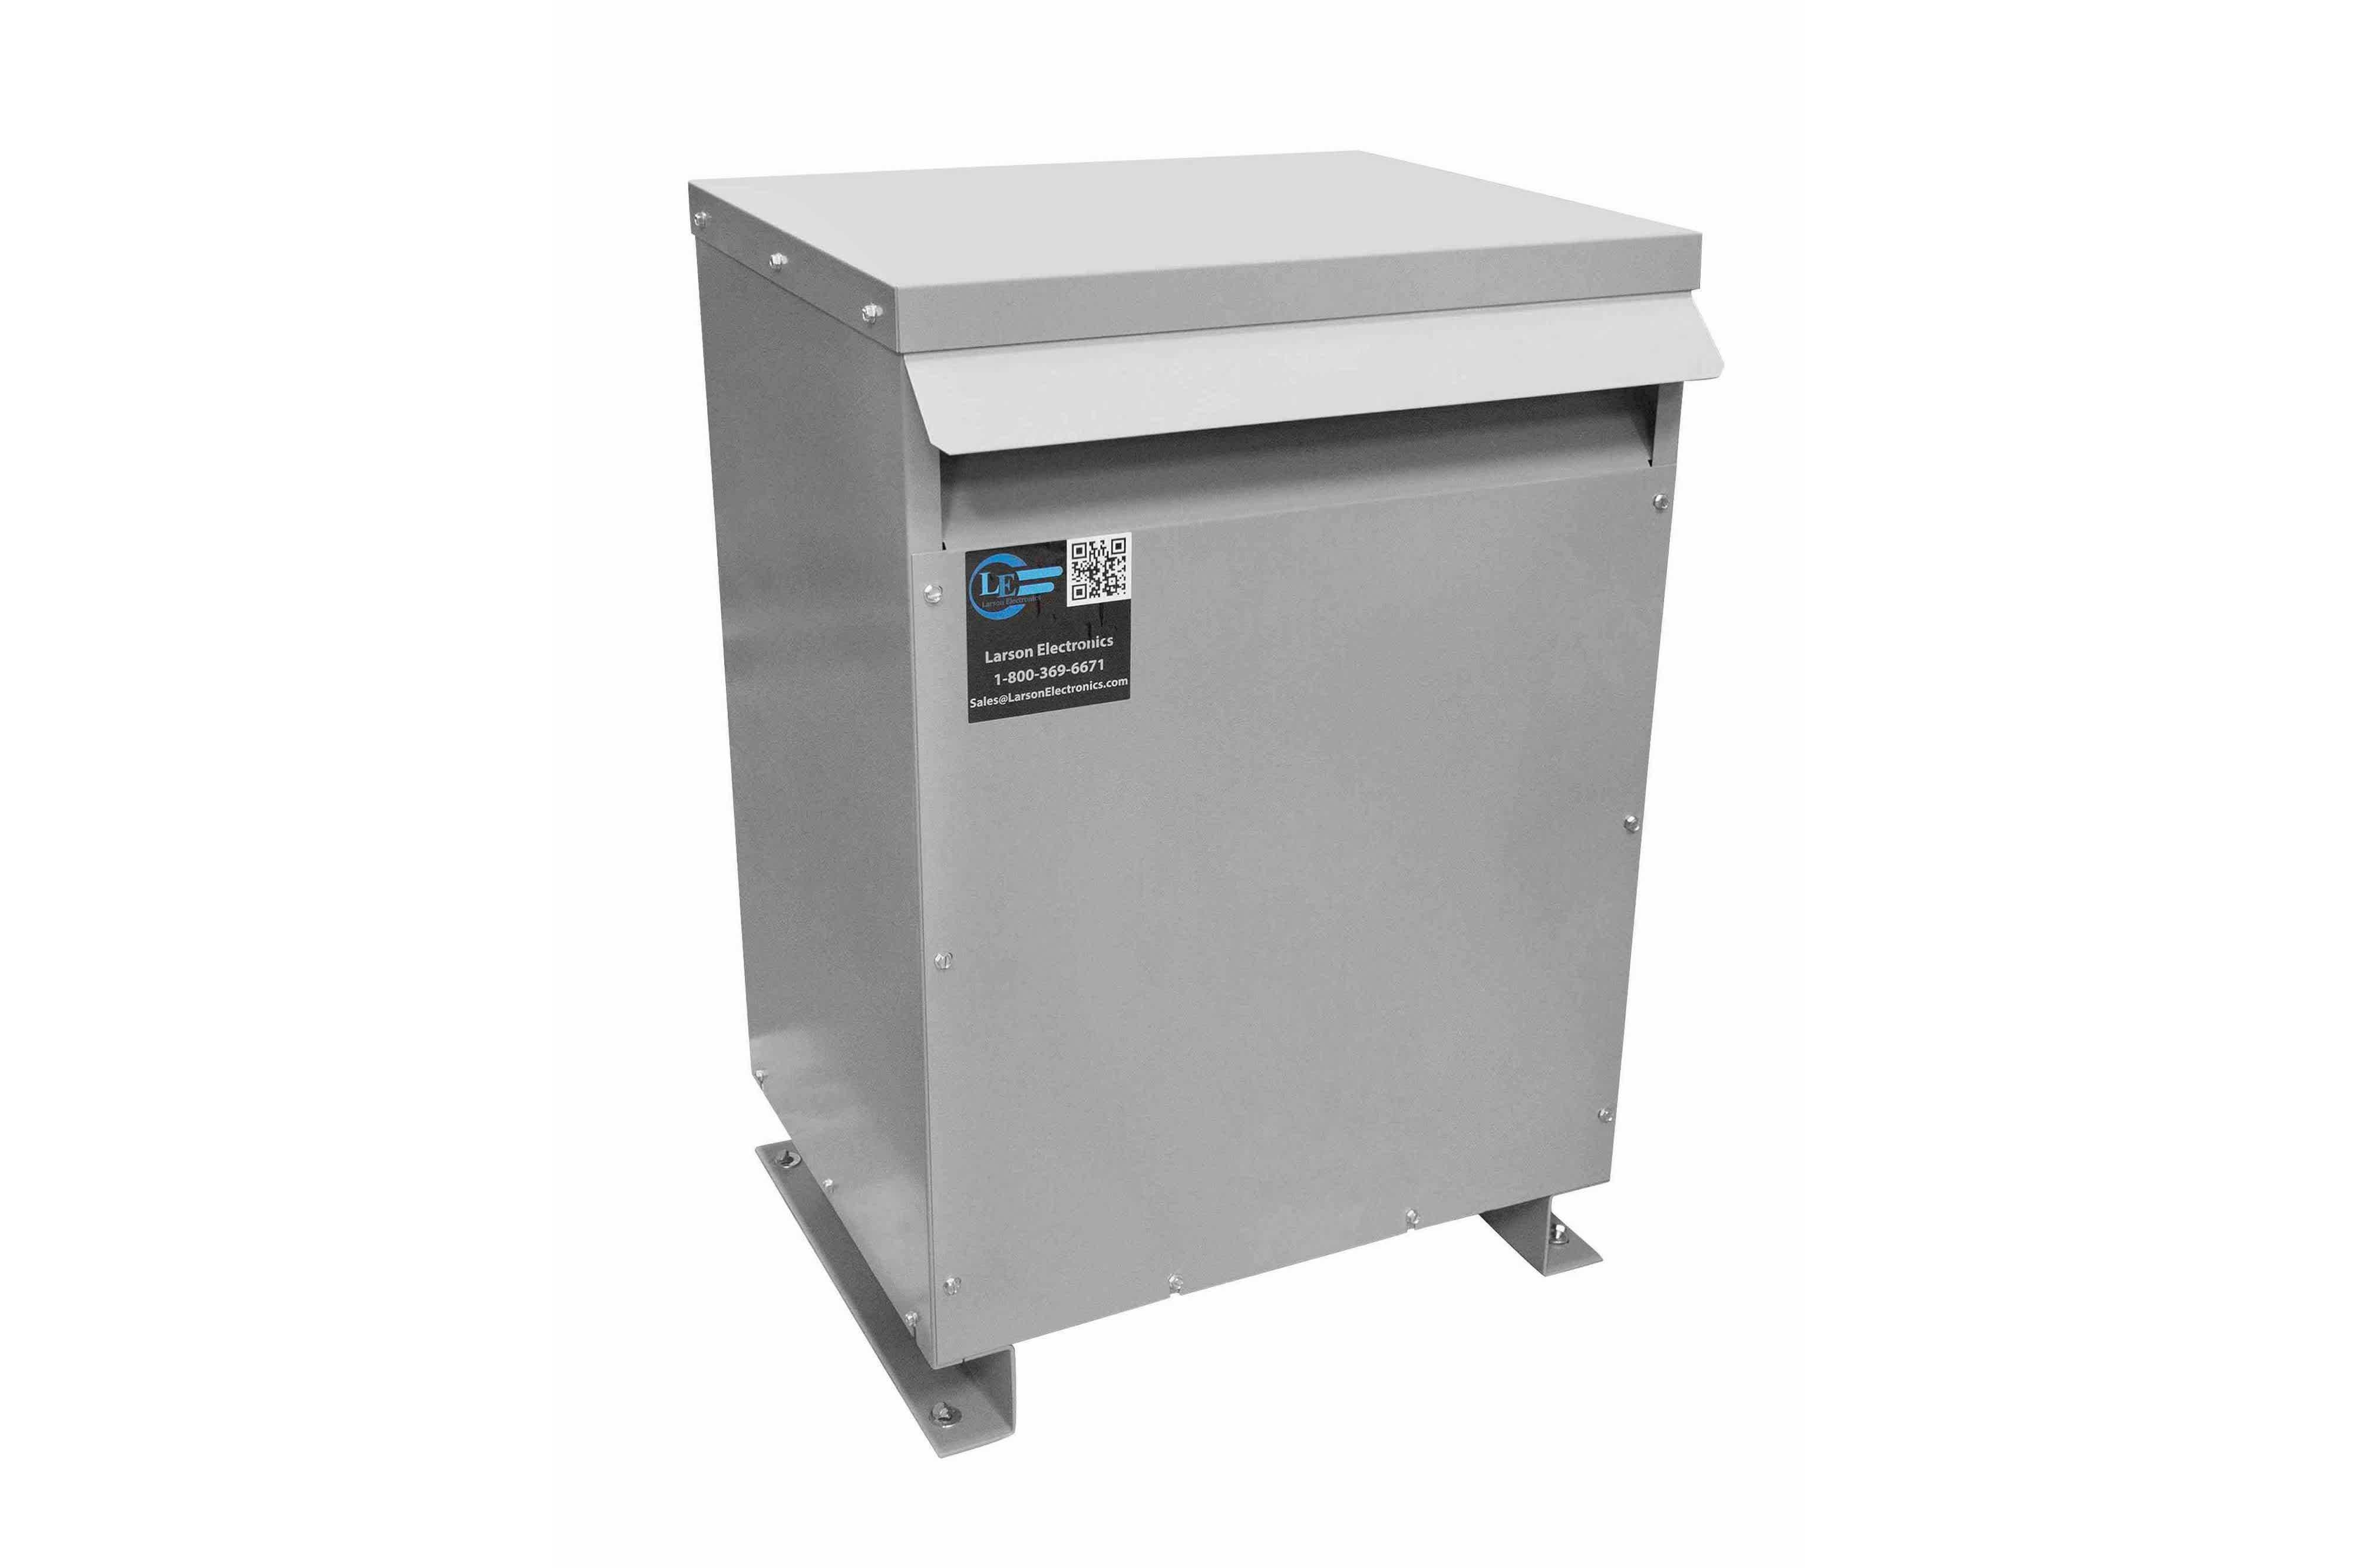 400 kVA 3PH Isolation Transformer, 400V Wye Primary, 600V Delta Secondary, N3R, Ventilated, 60 Hz